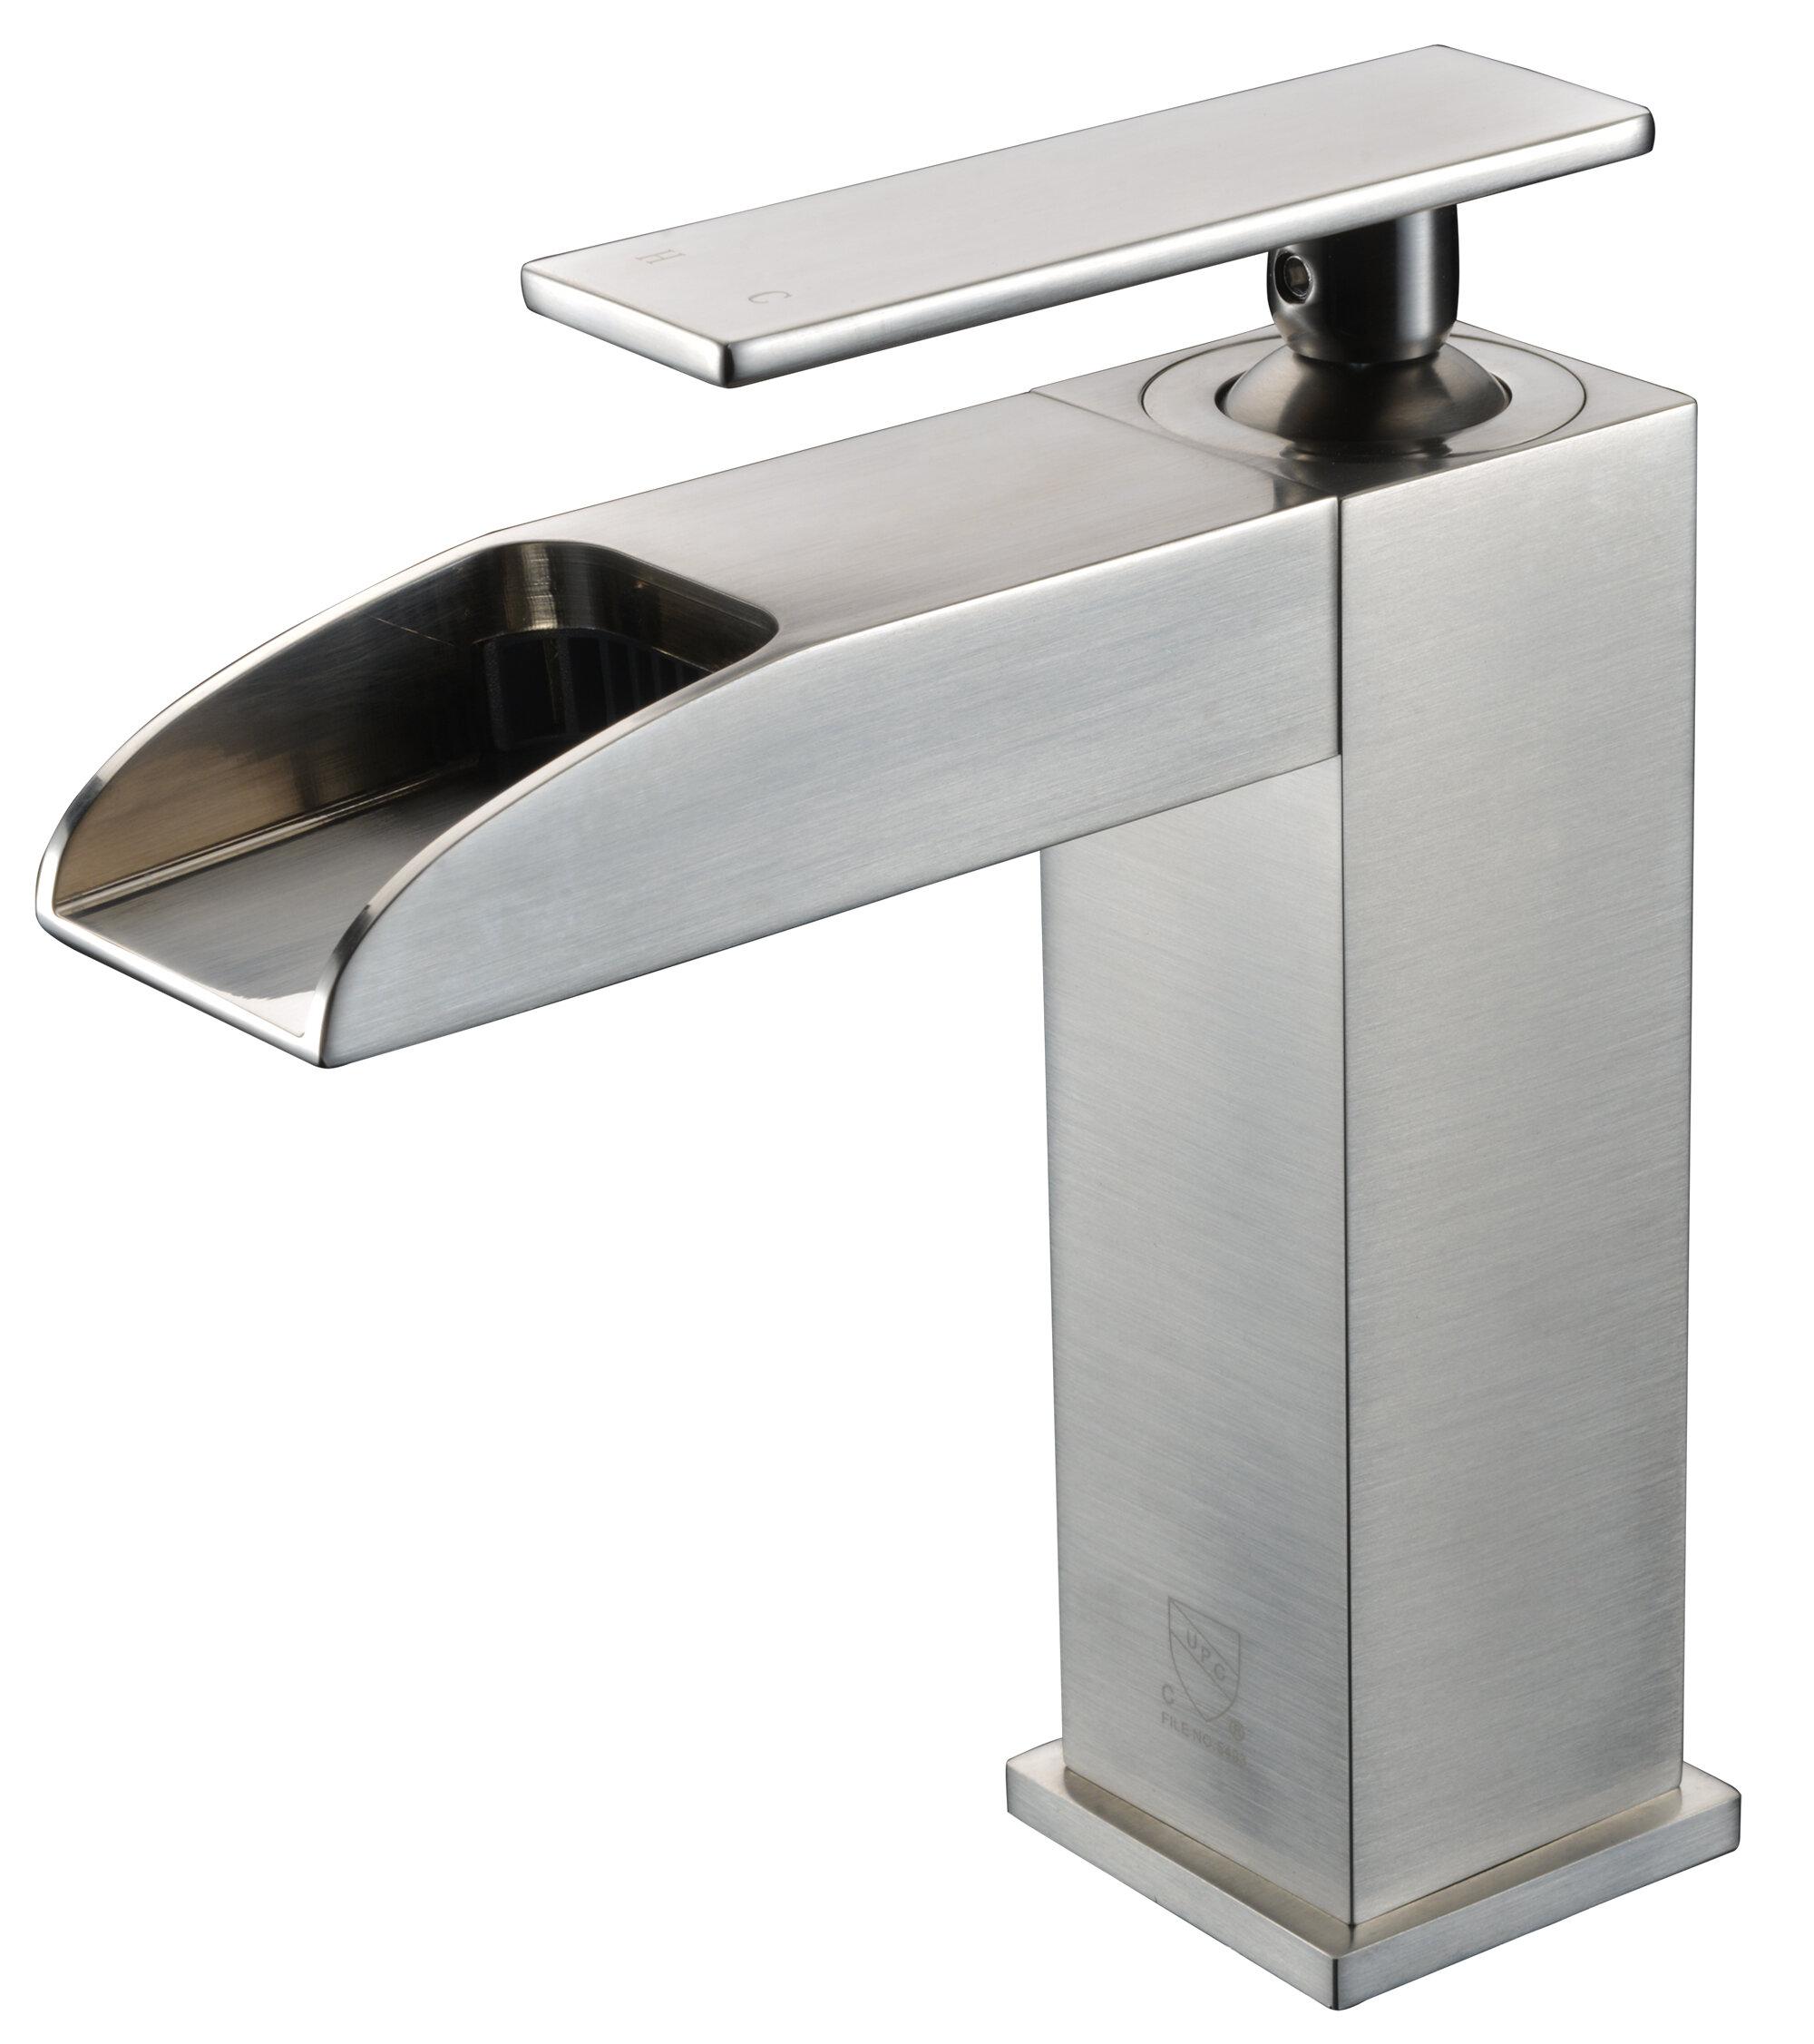 Alfi Brand Waterfall Deck Mounted Bathroom Faucet Wayfair